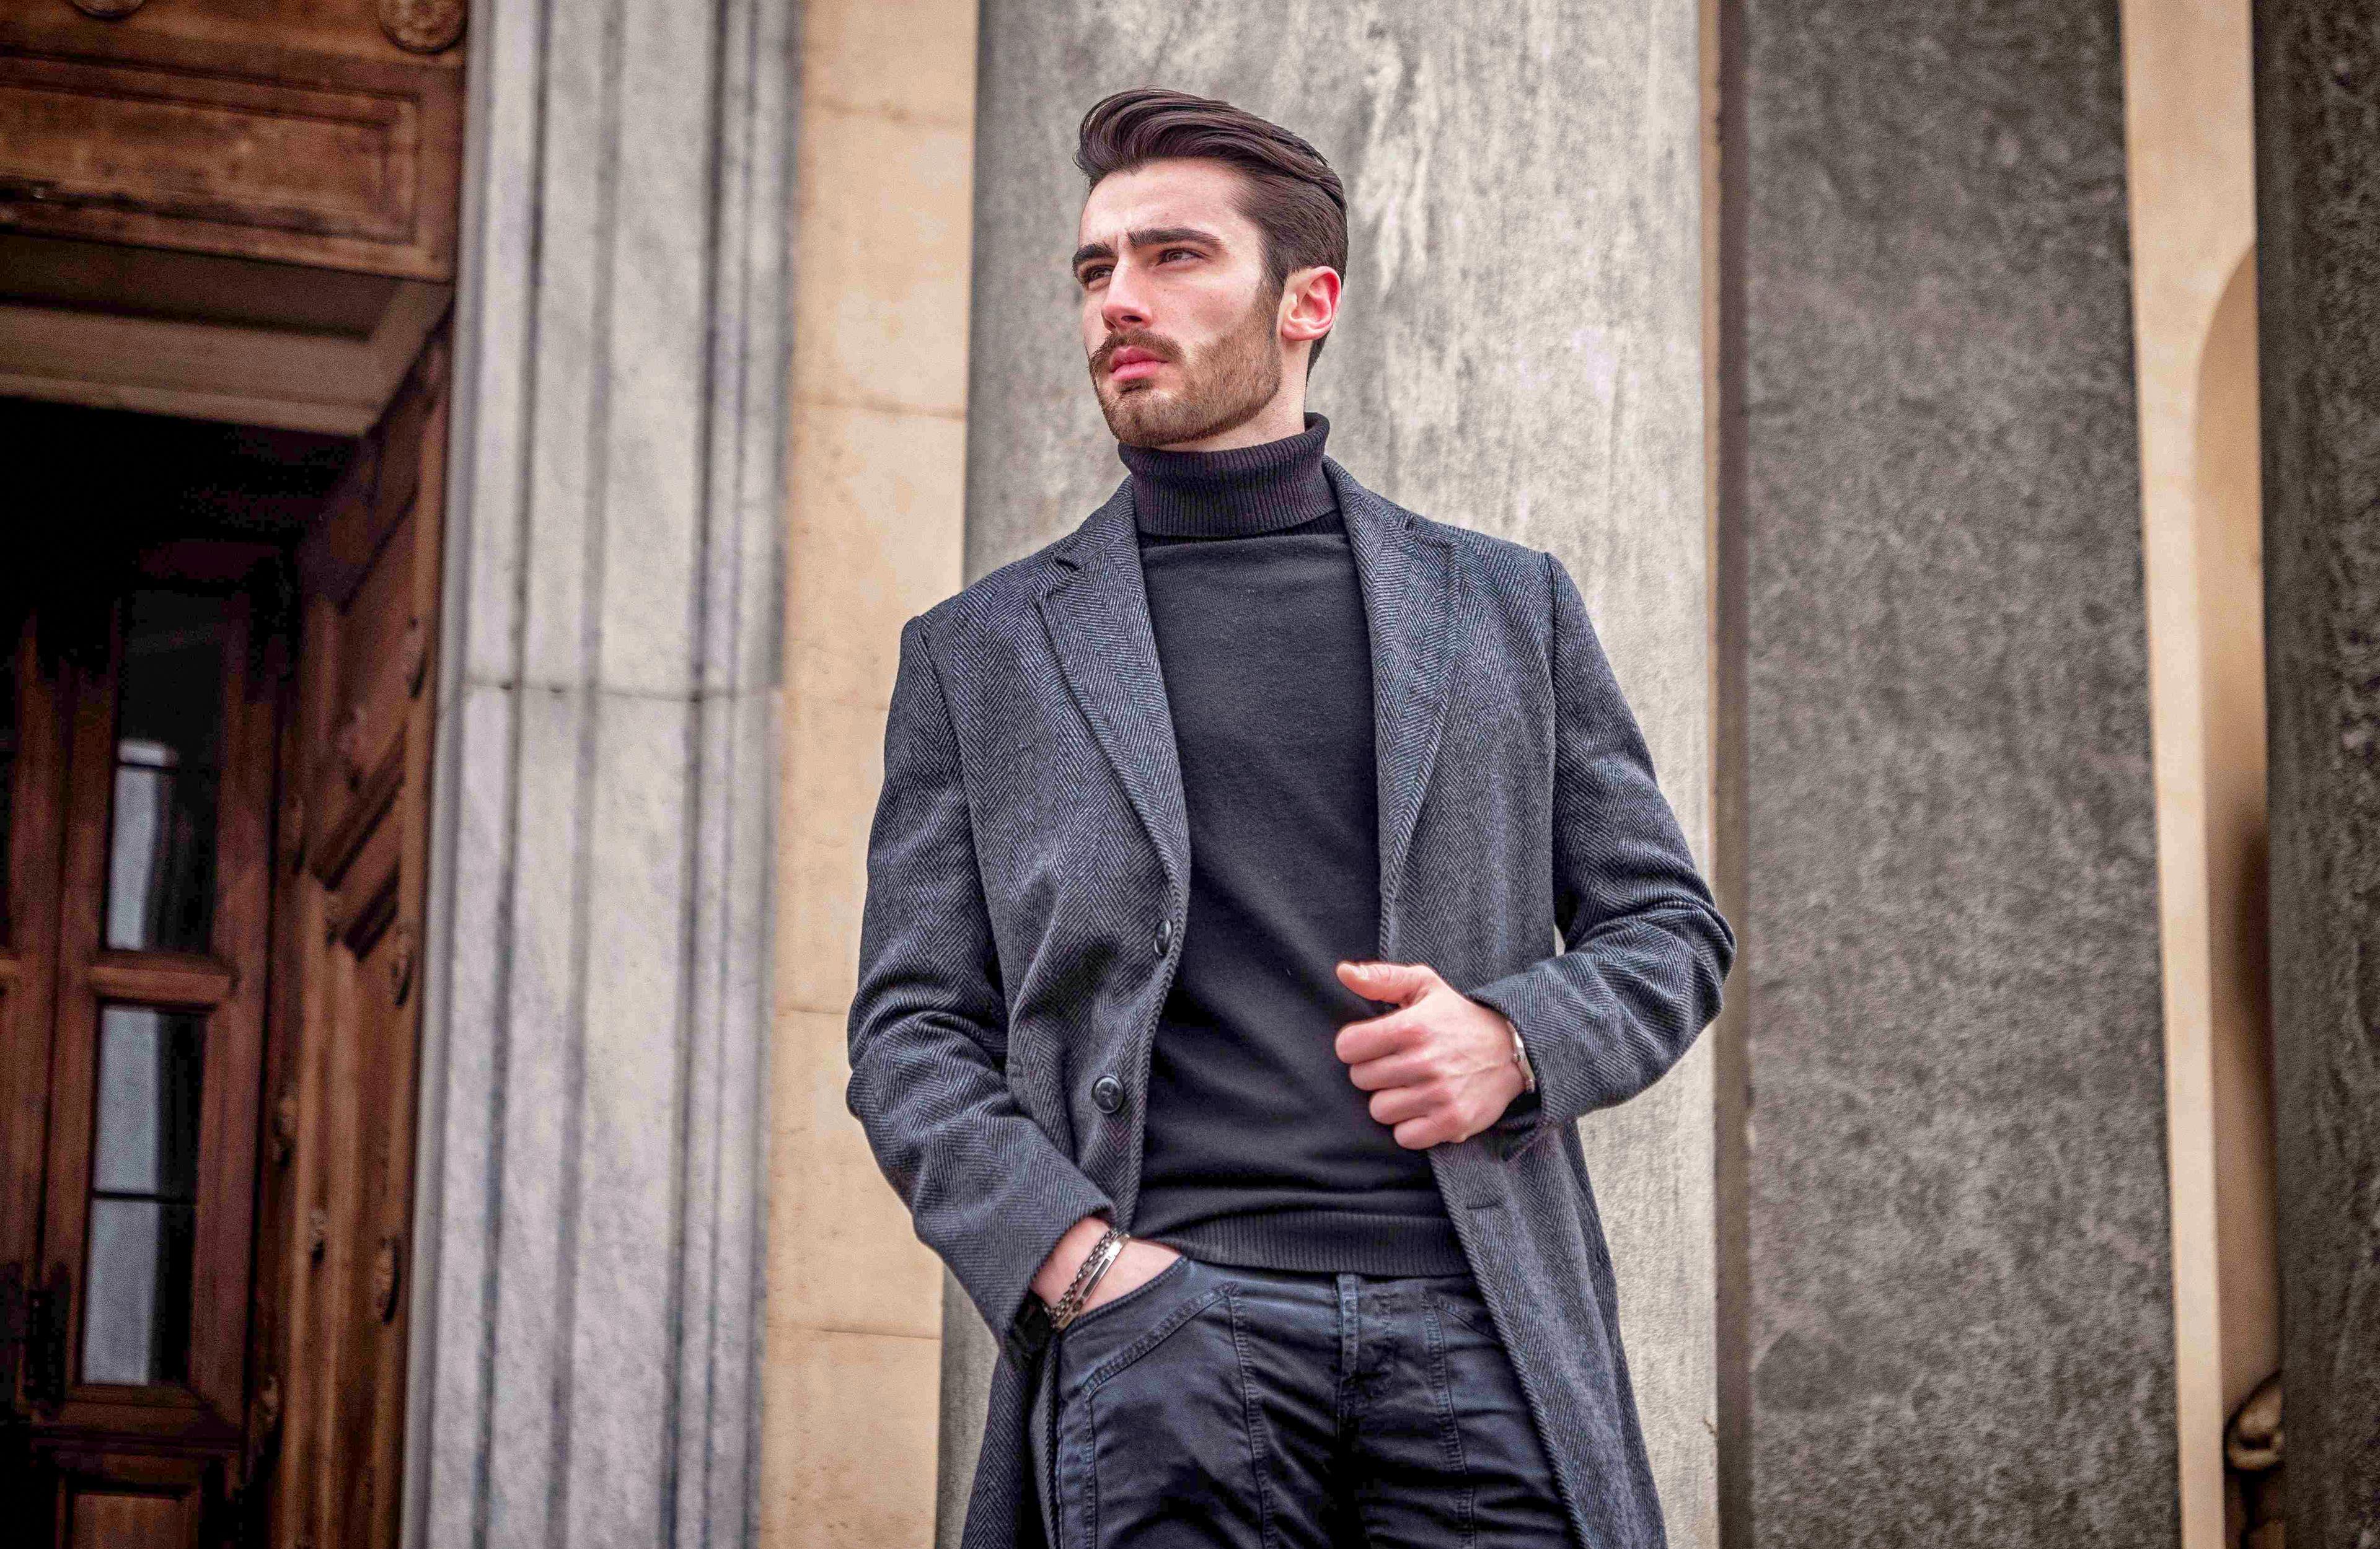 Men's business casual dress code & attire